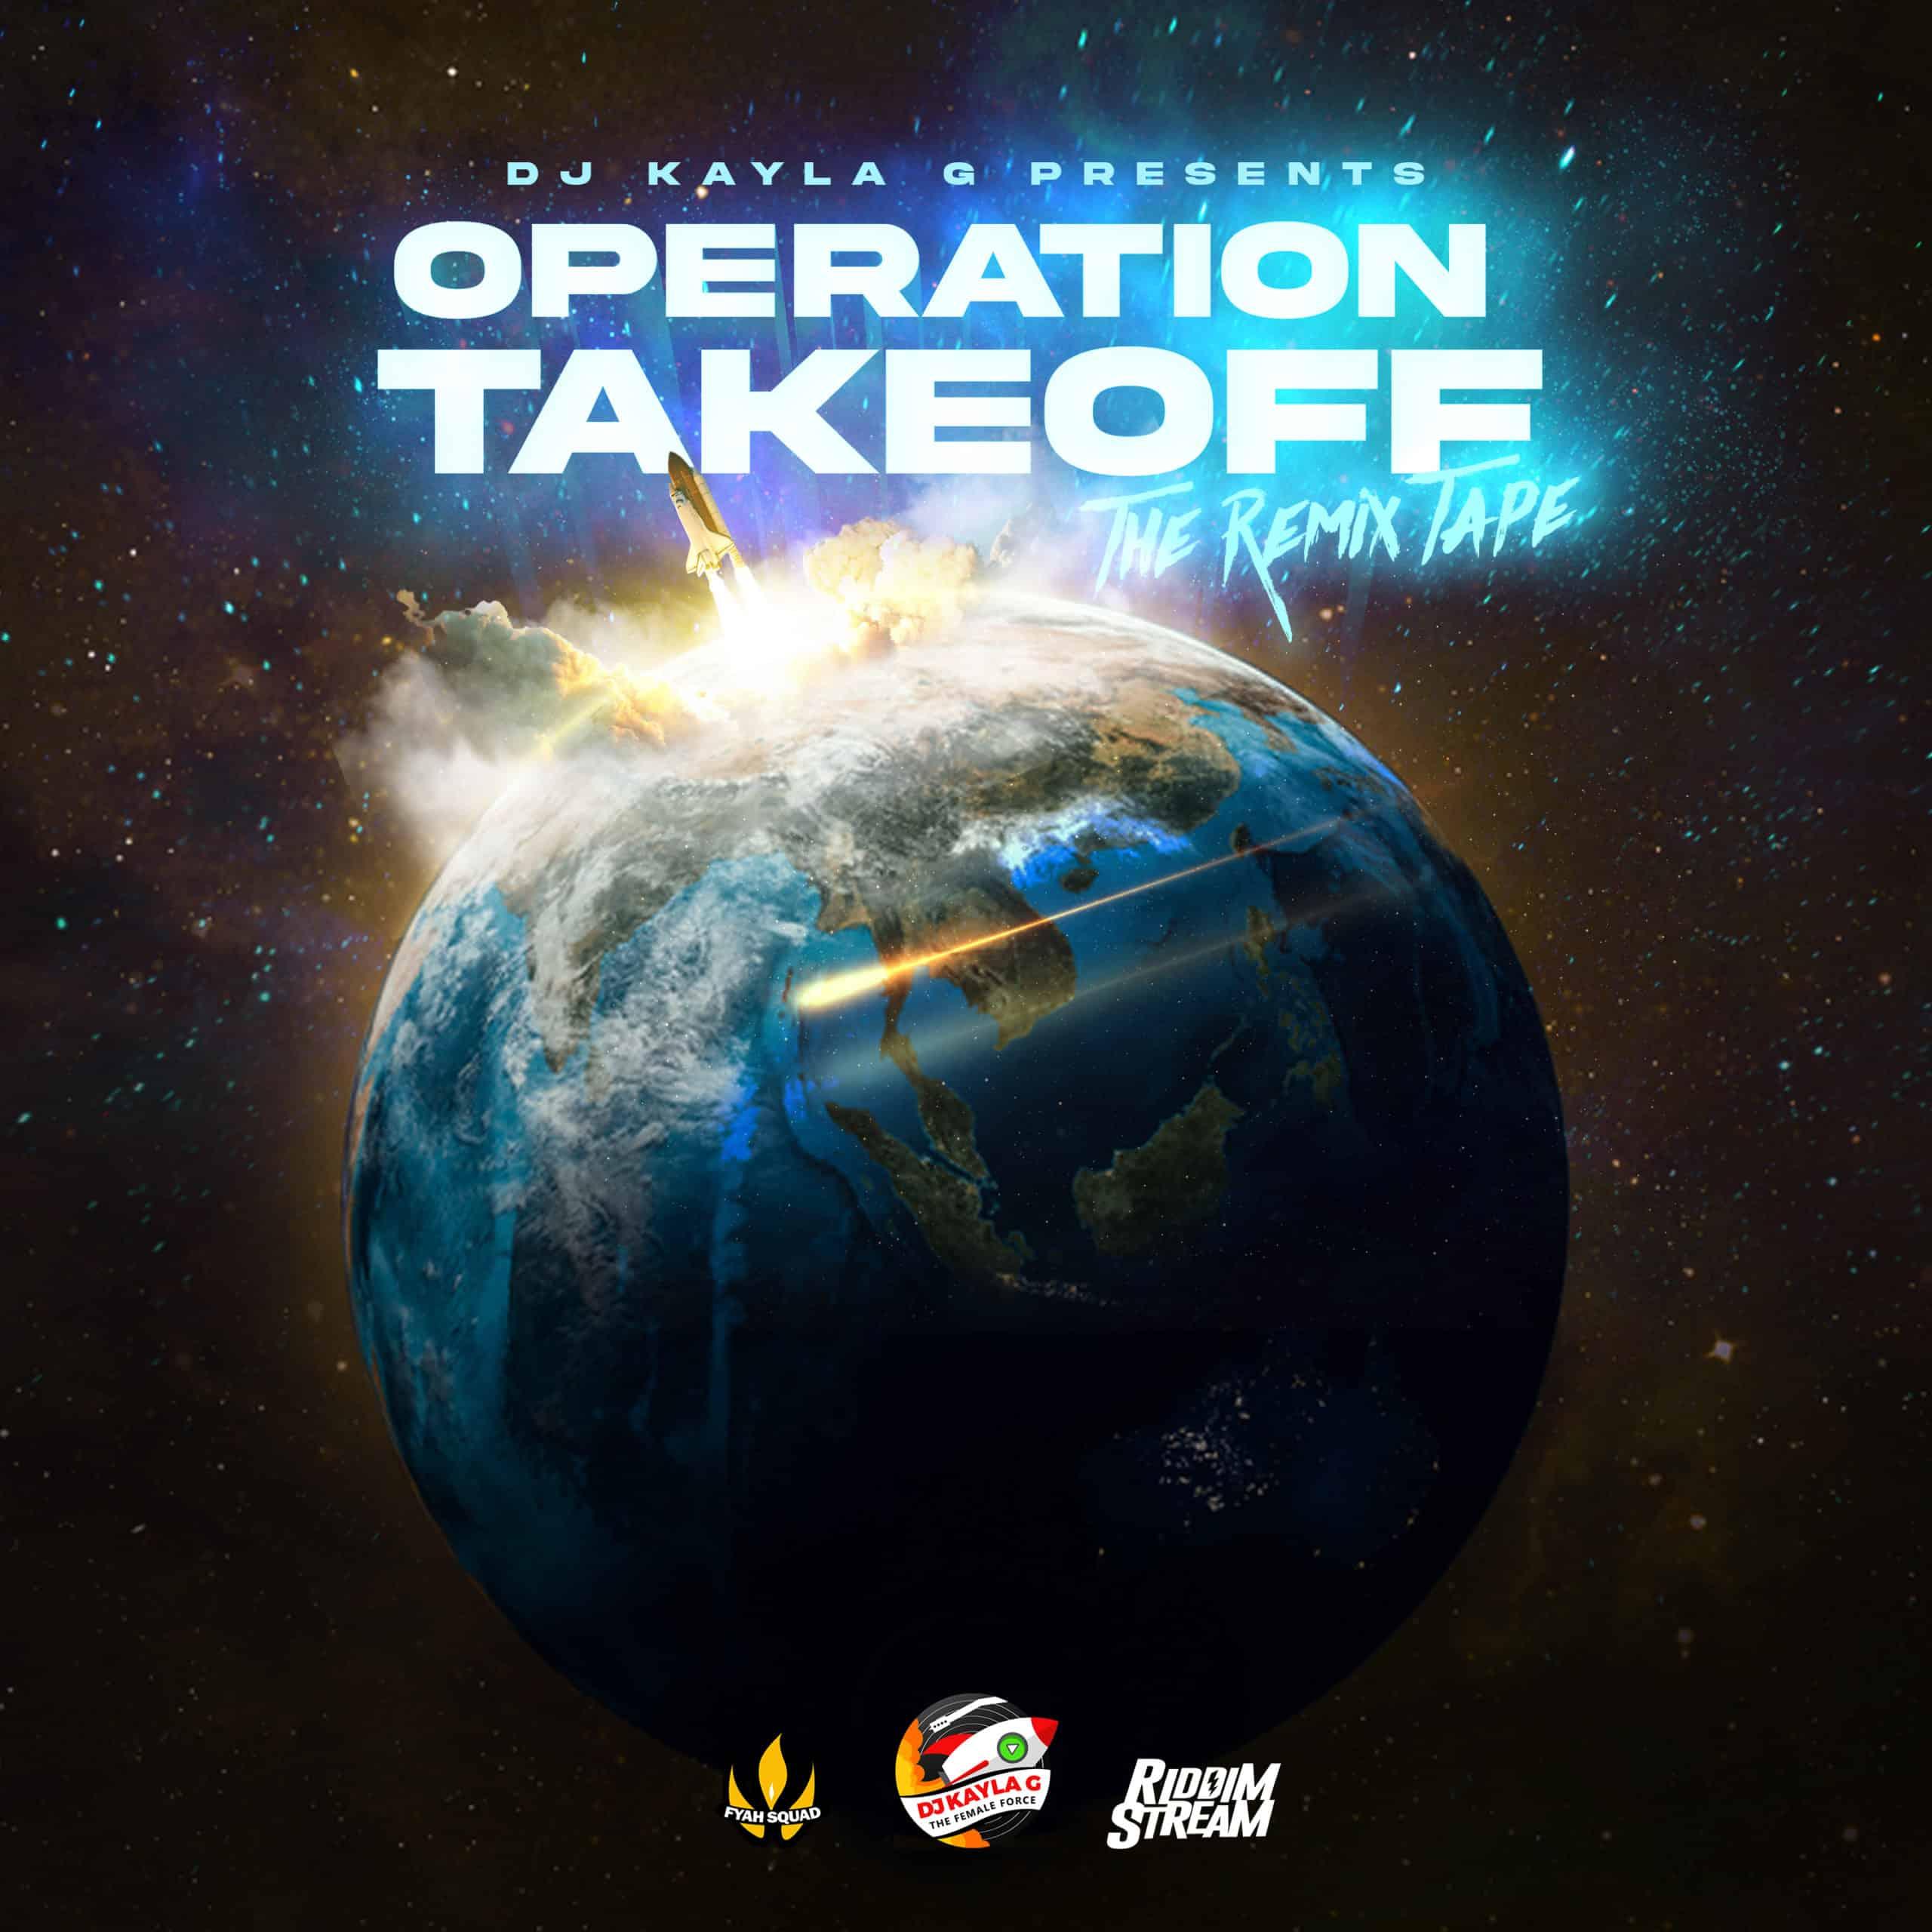 DJ Kayla G - OPERATION TAKEOFF - The Remix Tape (2020 Mixtape)